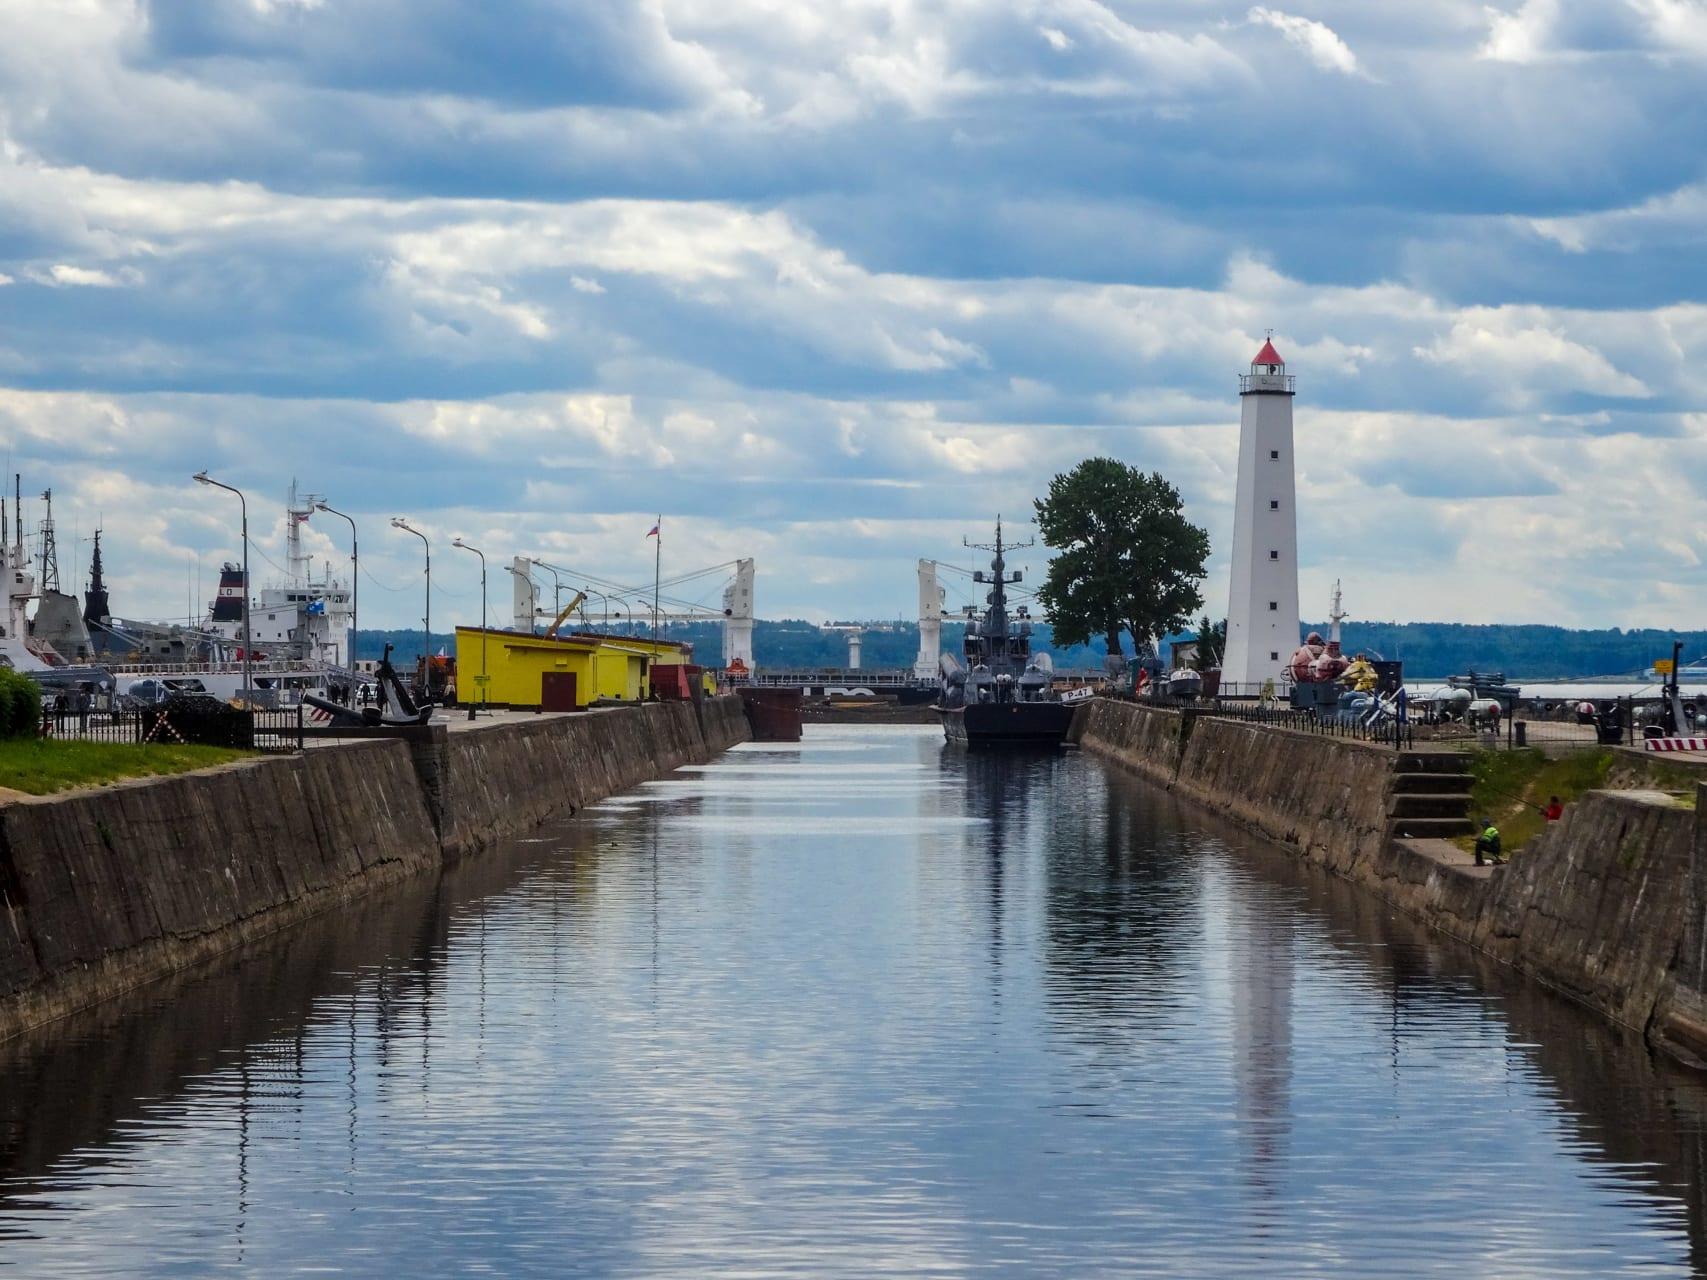 Saint Petersburg - Kronstadt Part III - Boat Trip in the Gulf of Finland